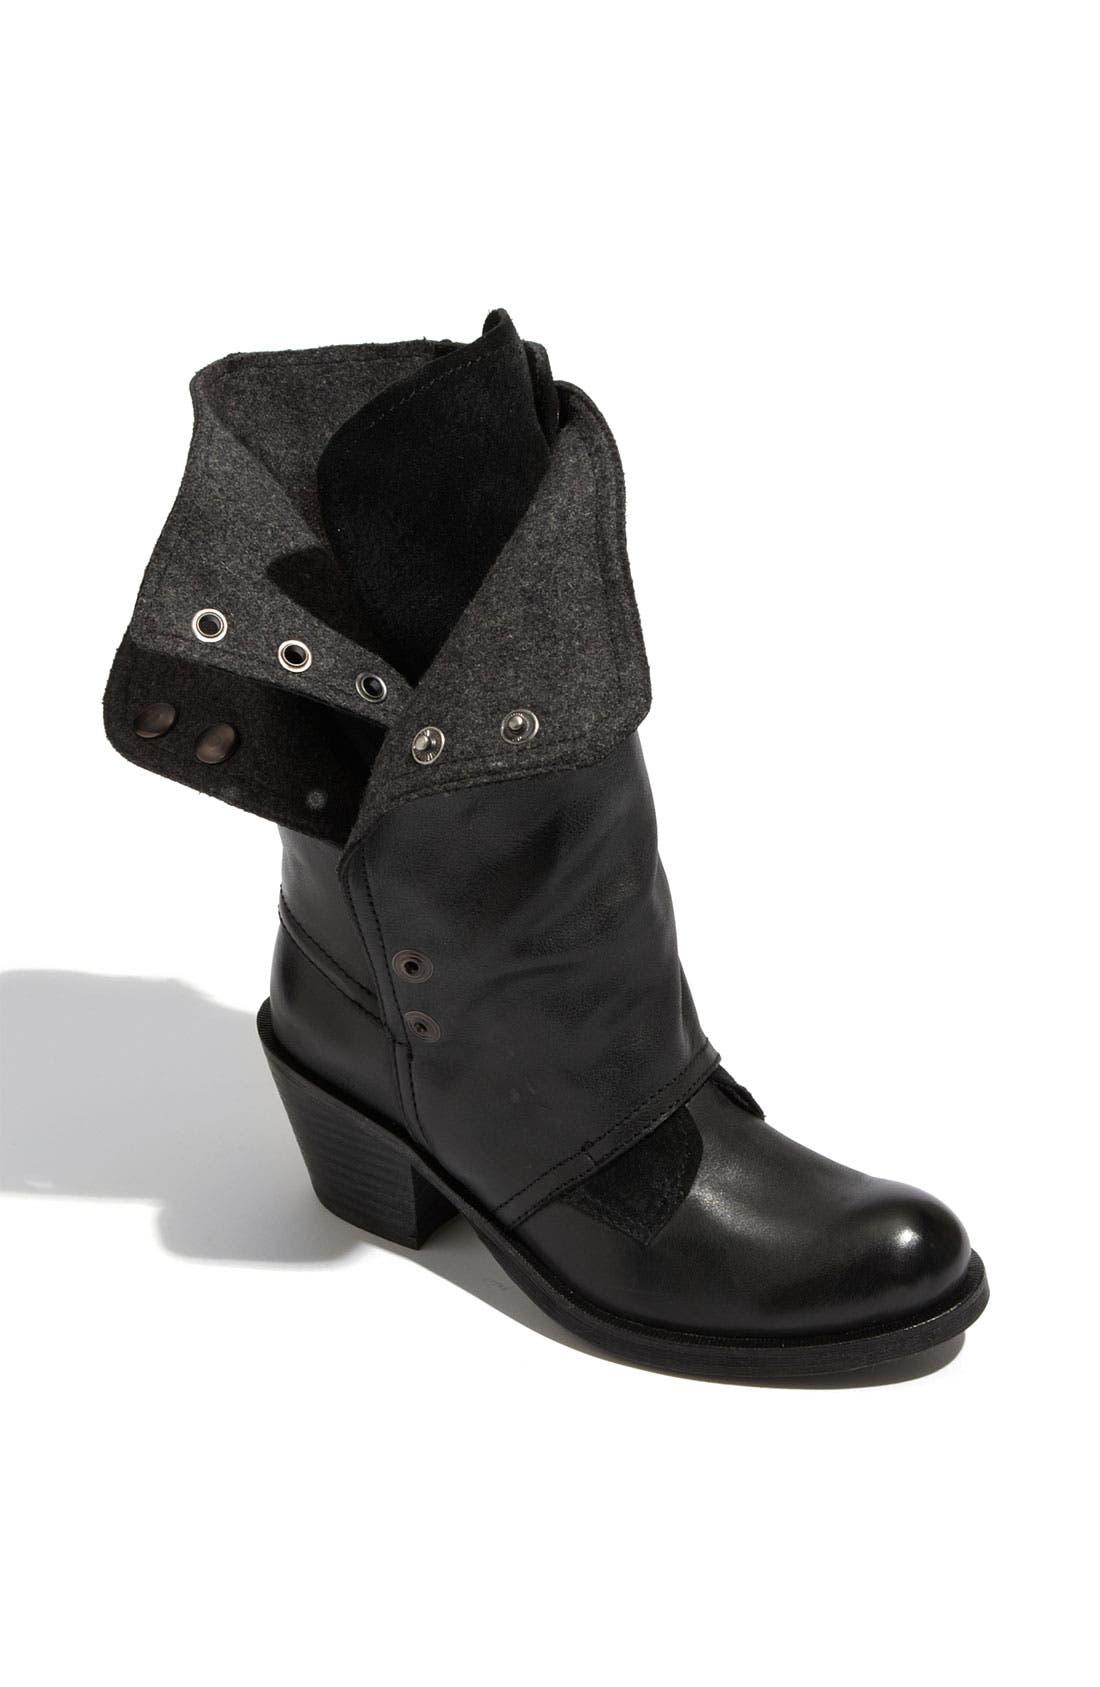 'Brady' Boot,                             Main thumbnail 1, color,                             Black Leather